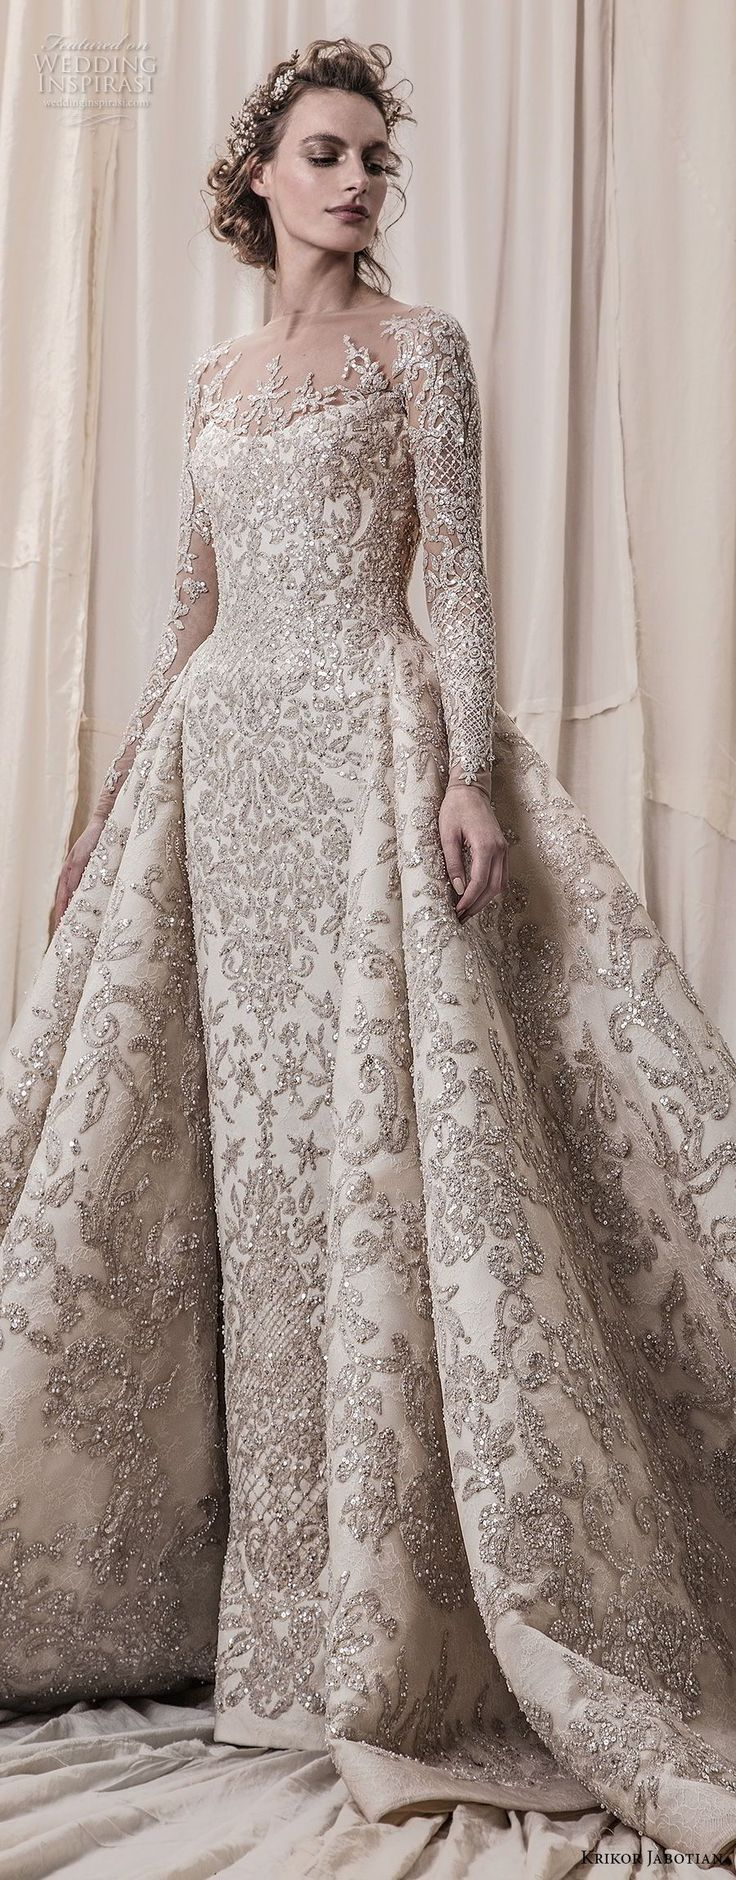 Long Sleeve Wedding Dress krikor jabotian spring 2018 bridal long sleeves scoop neck full embellishment glamorous princess ball gown a line wedding dress sheer button back royal train (04) lv